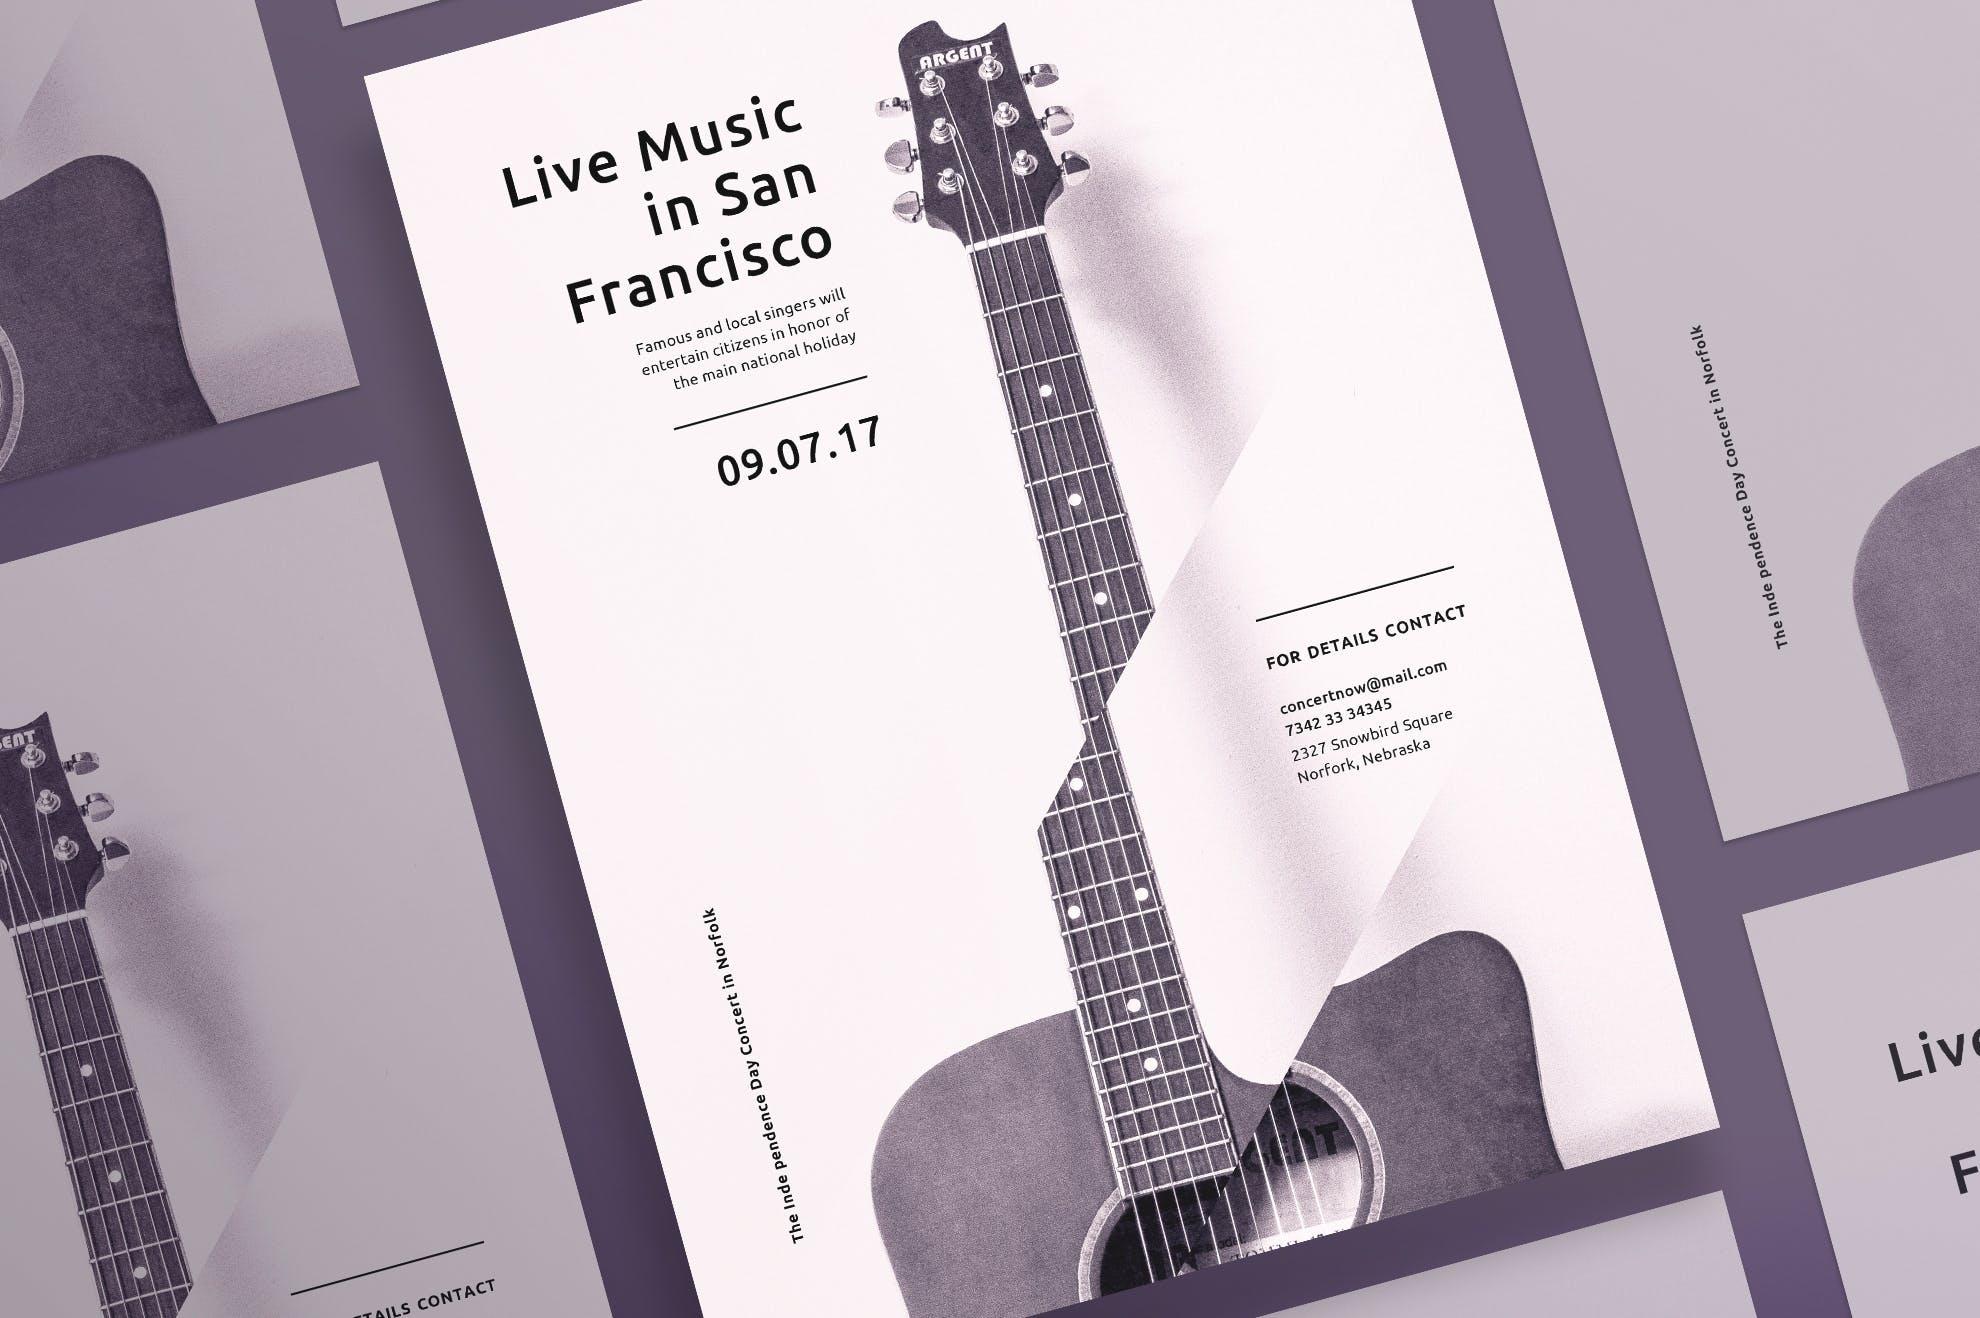 音乐会音乐会传单和海报模板Music Concert Flyer and Poster Template